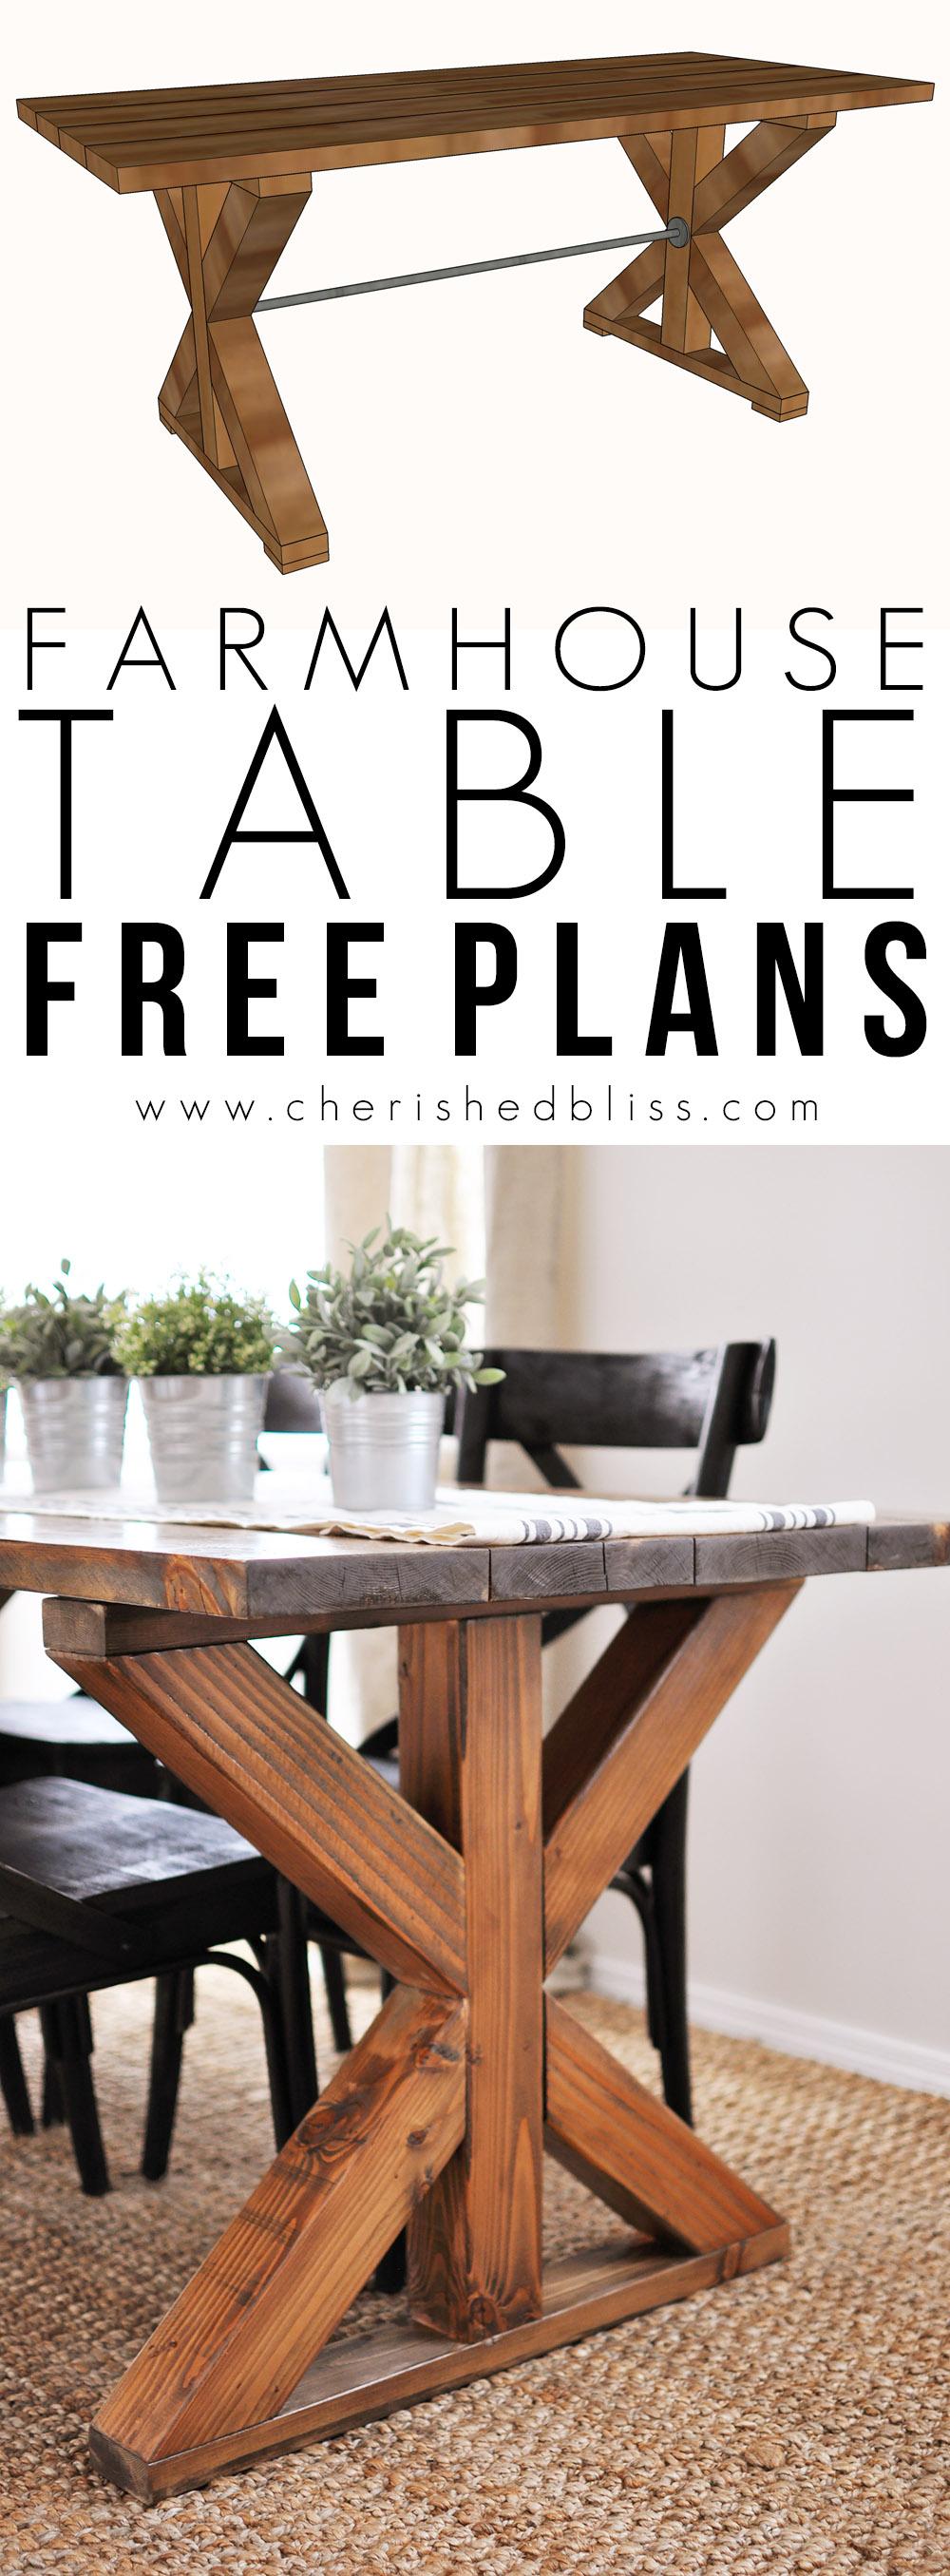 DIY Farm Table Build Plans And Makeover Ideas Fox Hollow Cottage - Farm table trestle base